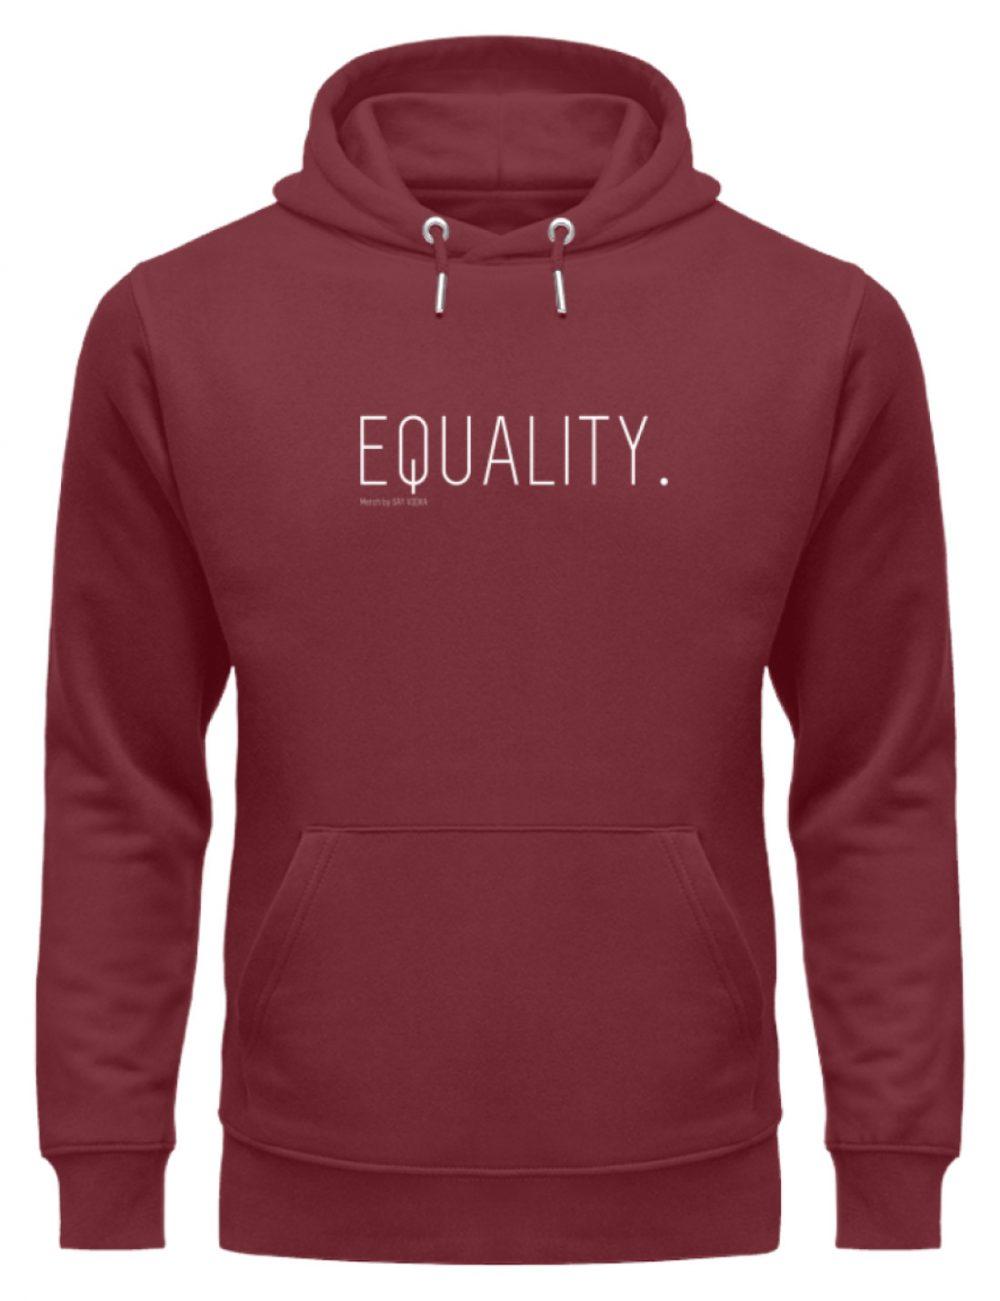 EQUALITY. - Unisex Organic Hoodie-6883